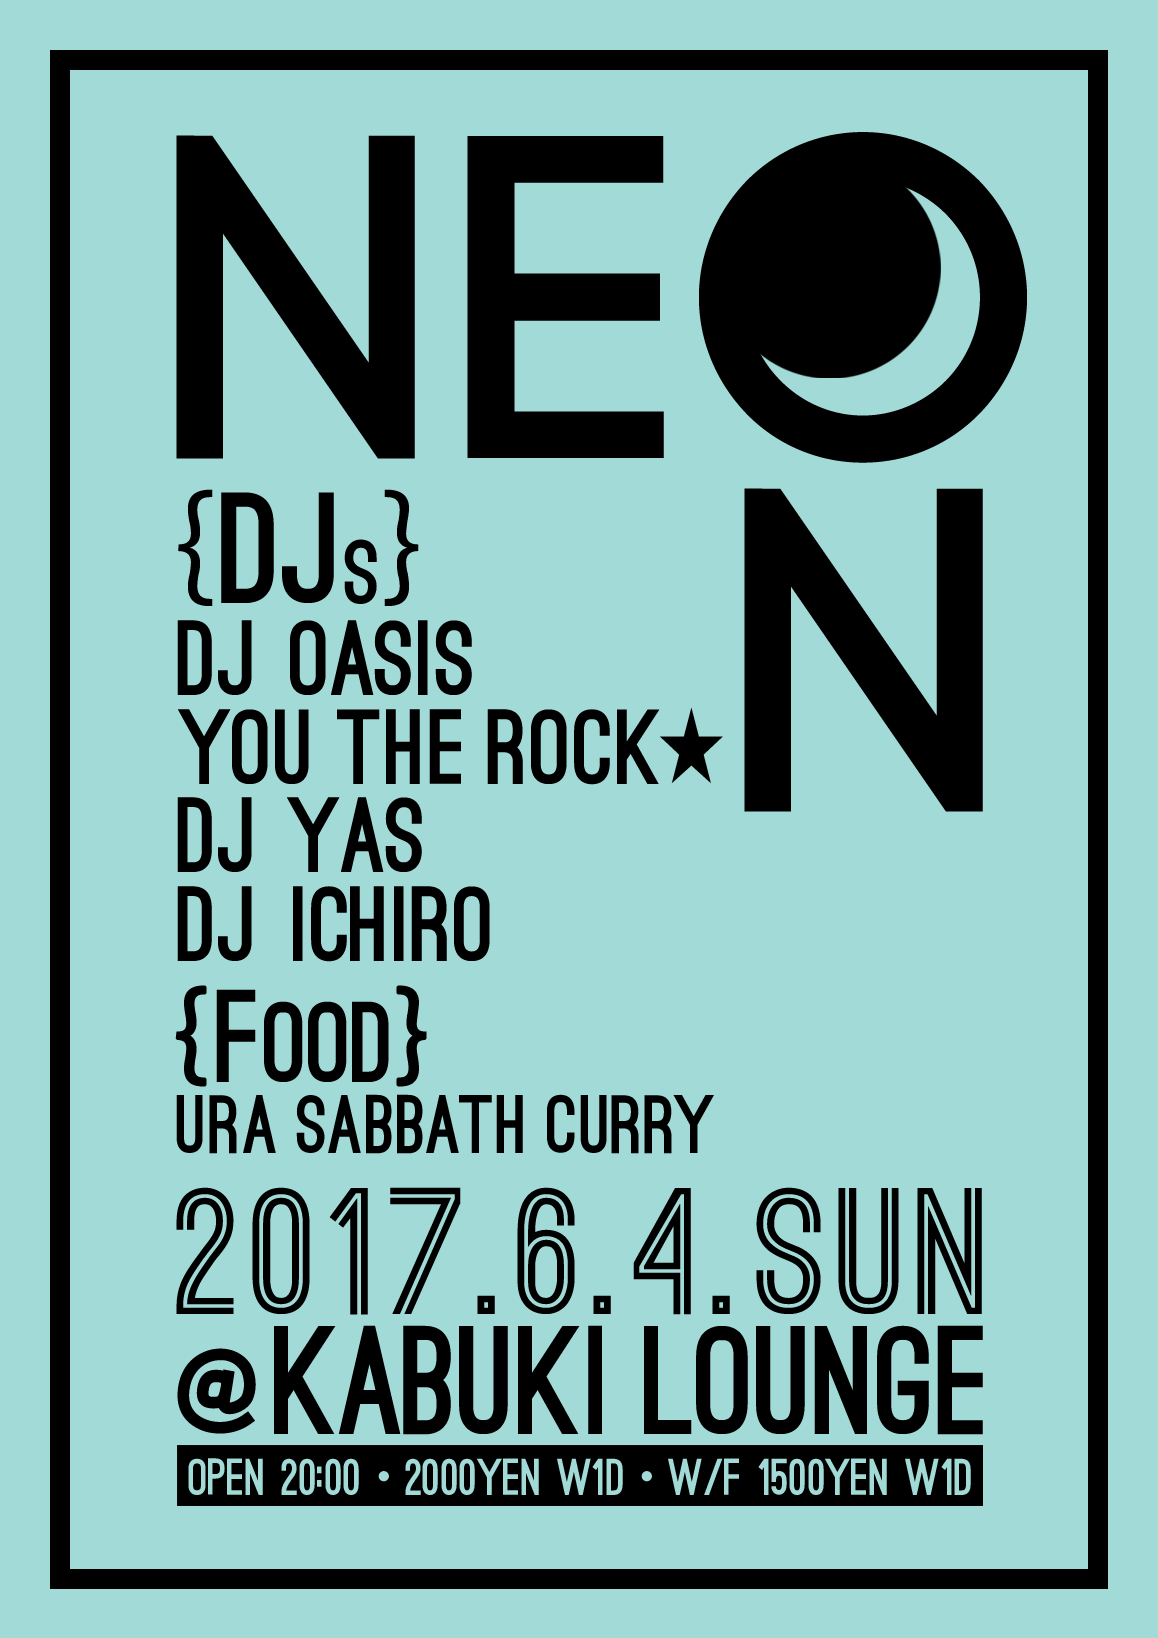 NEON_0604